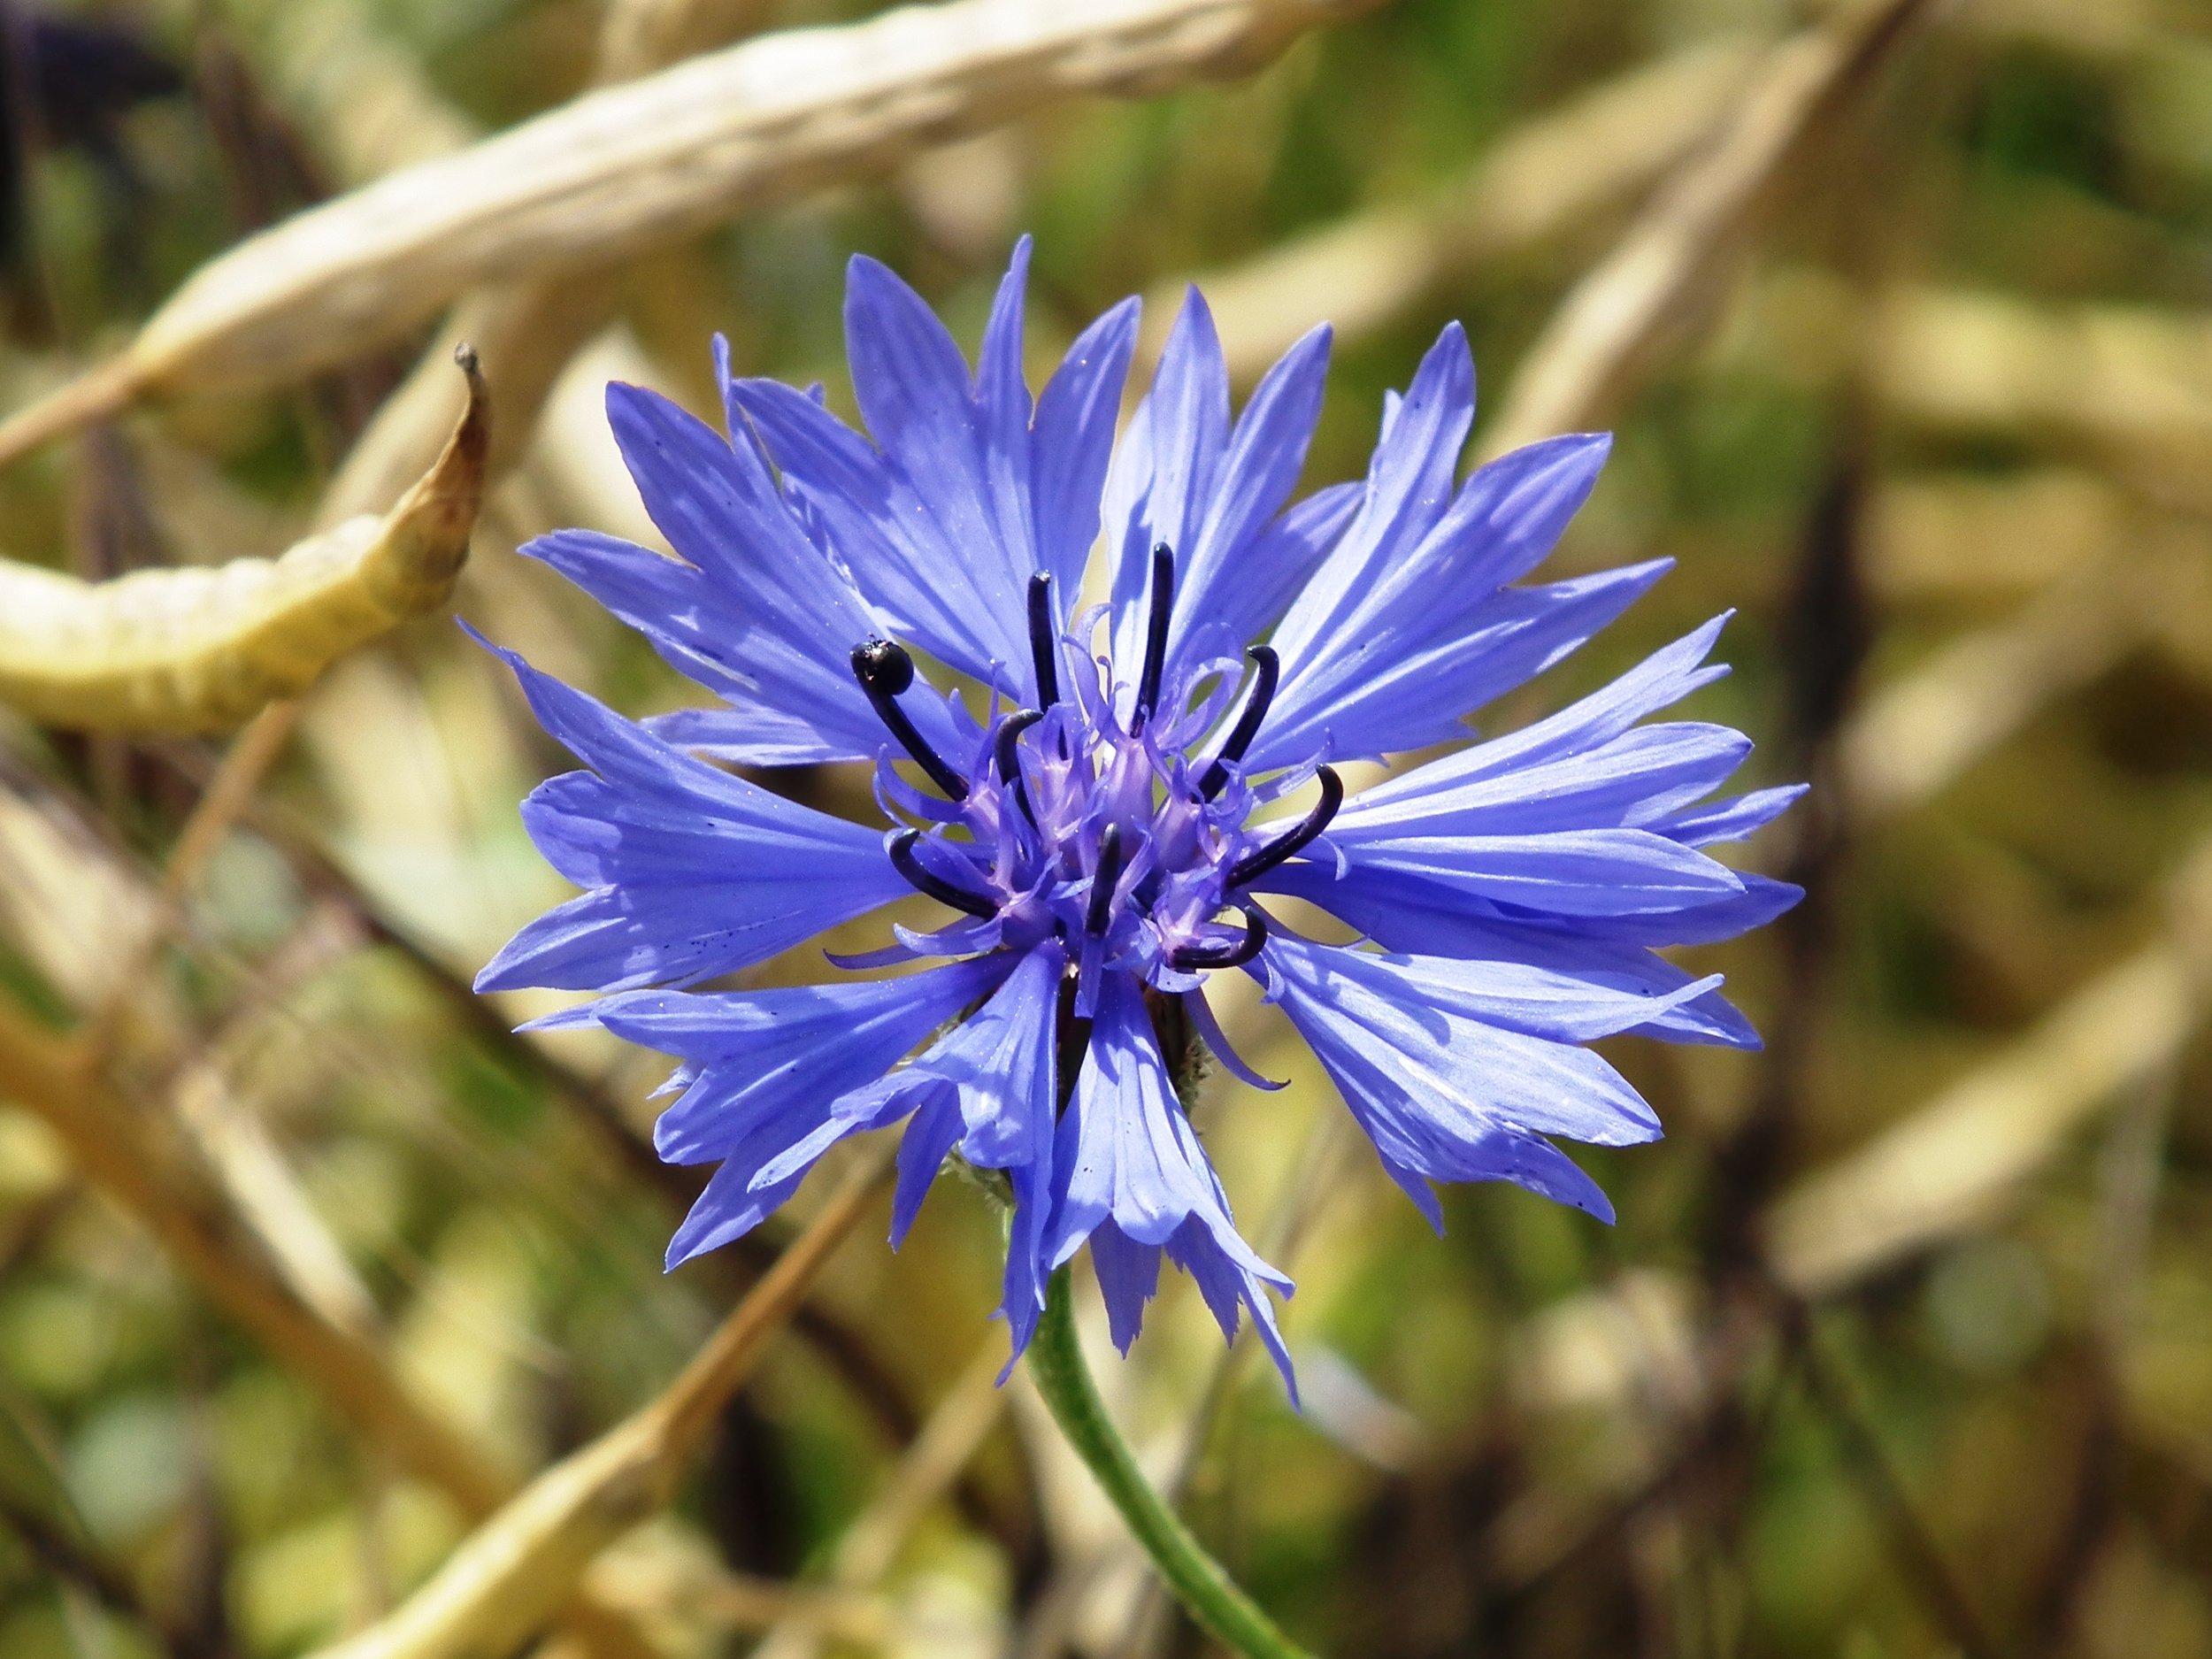 Cornflower - Centaurea cyanus